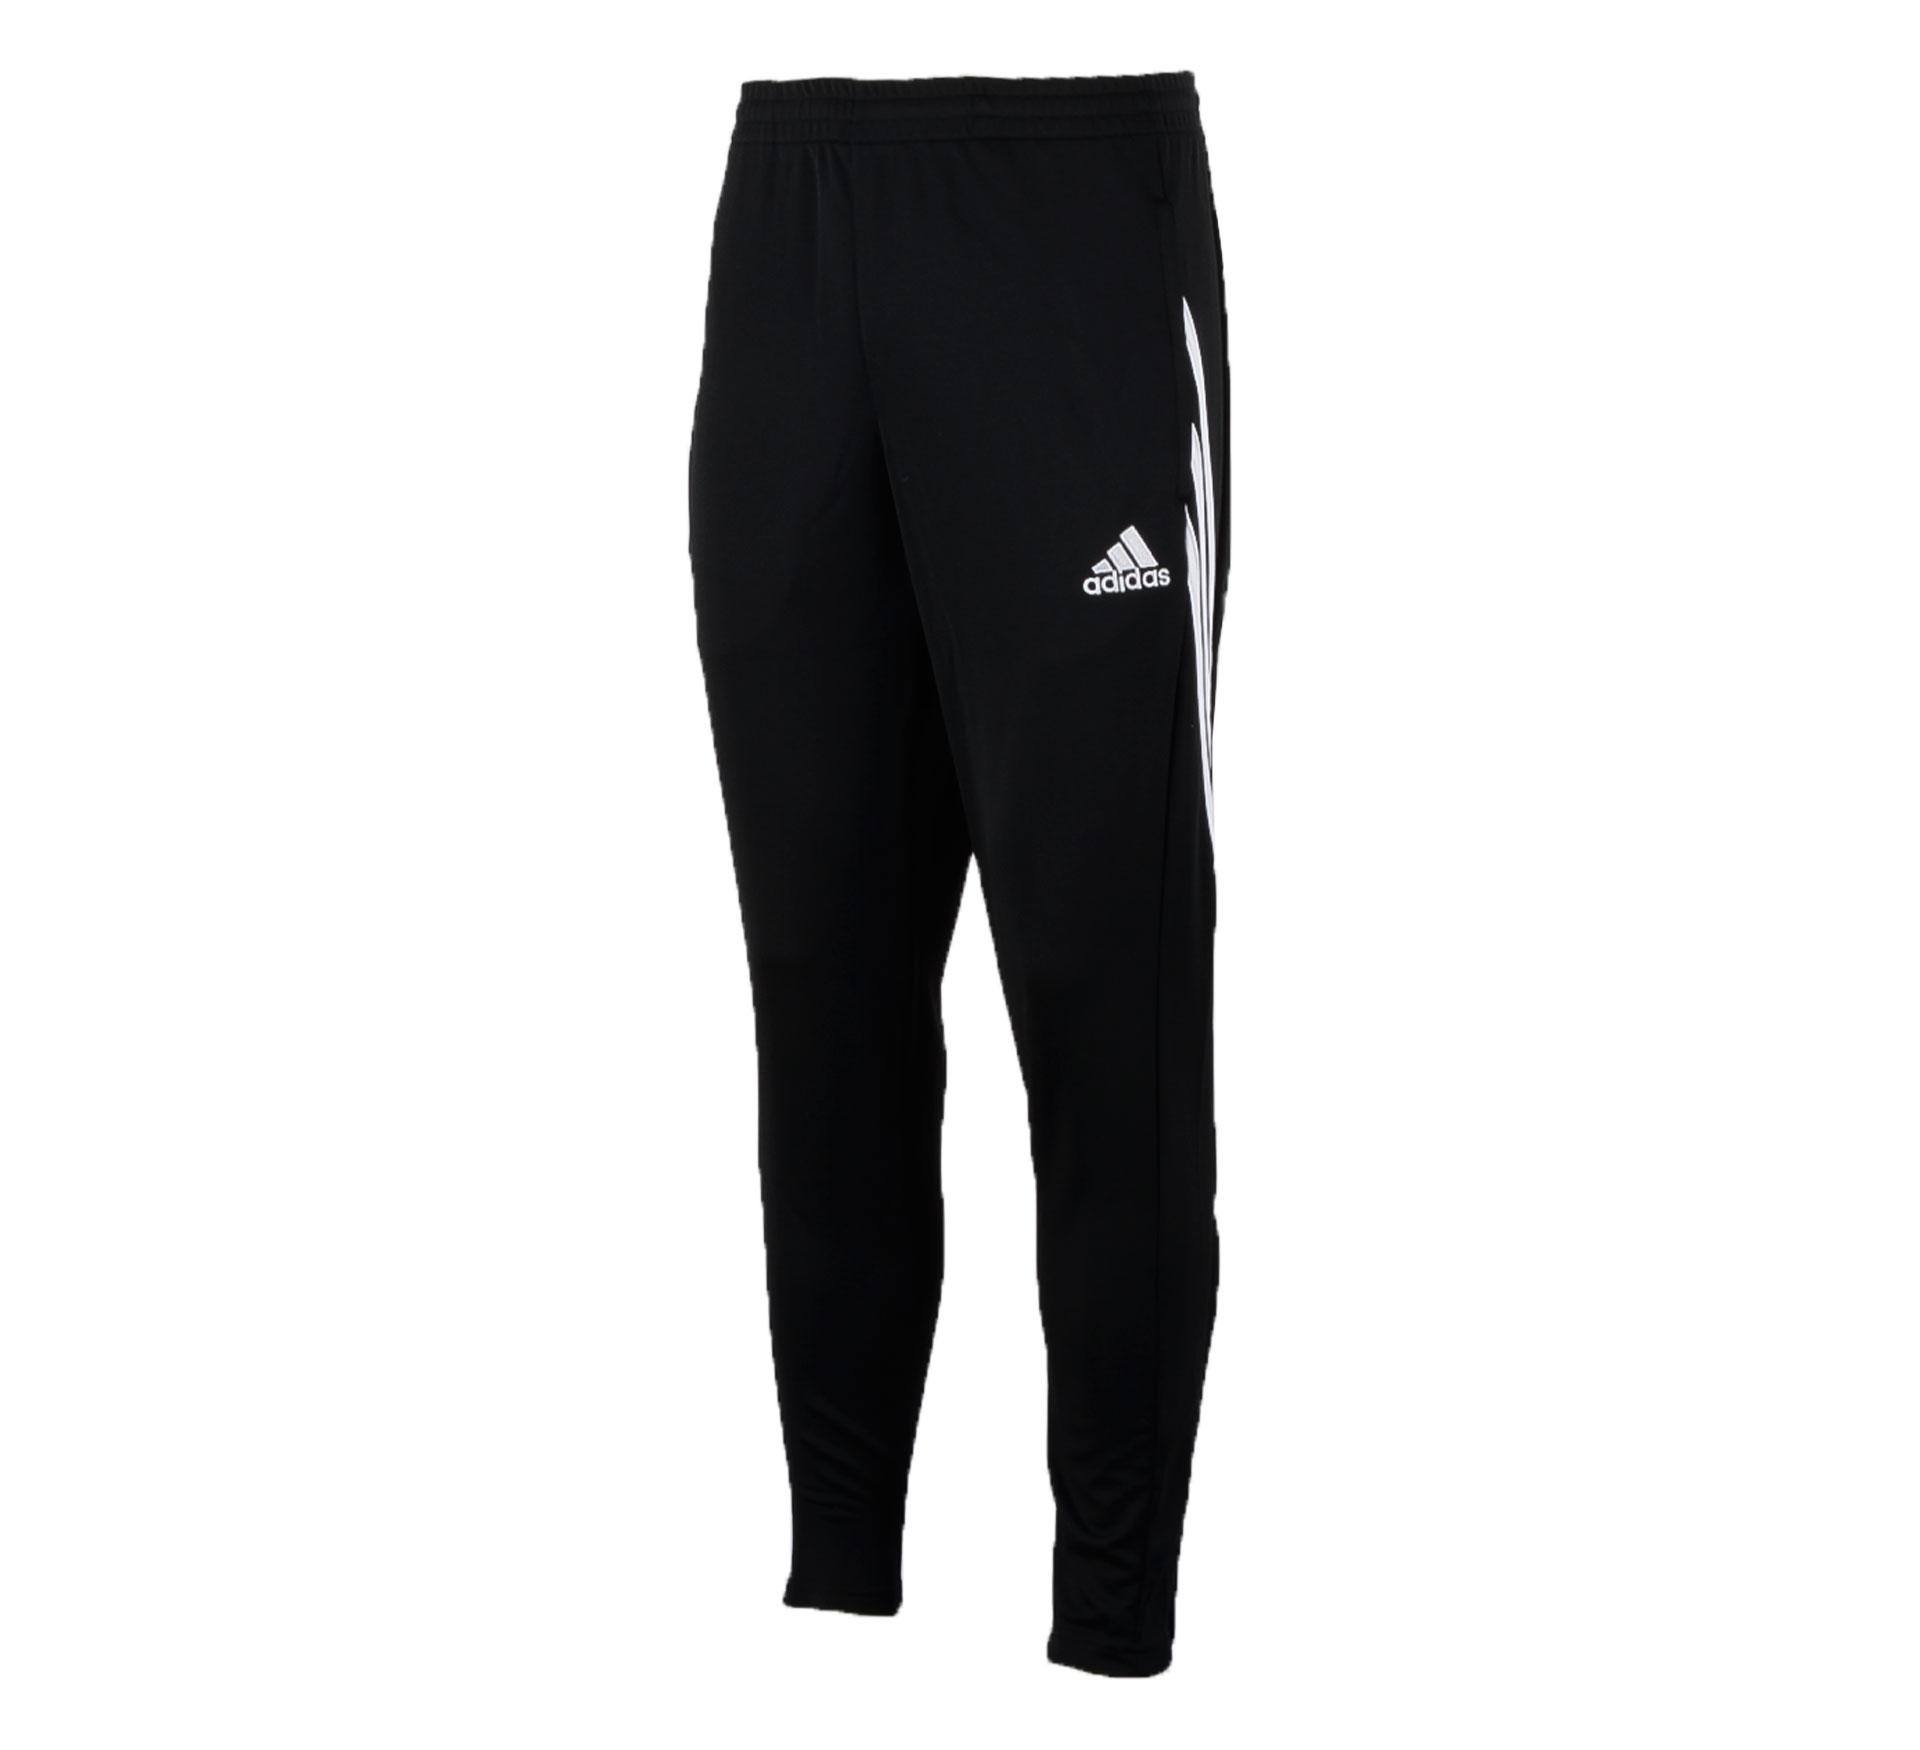 Adidas Sereno 14 Trainingsbroek Heren zwart - wit